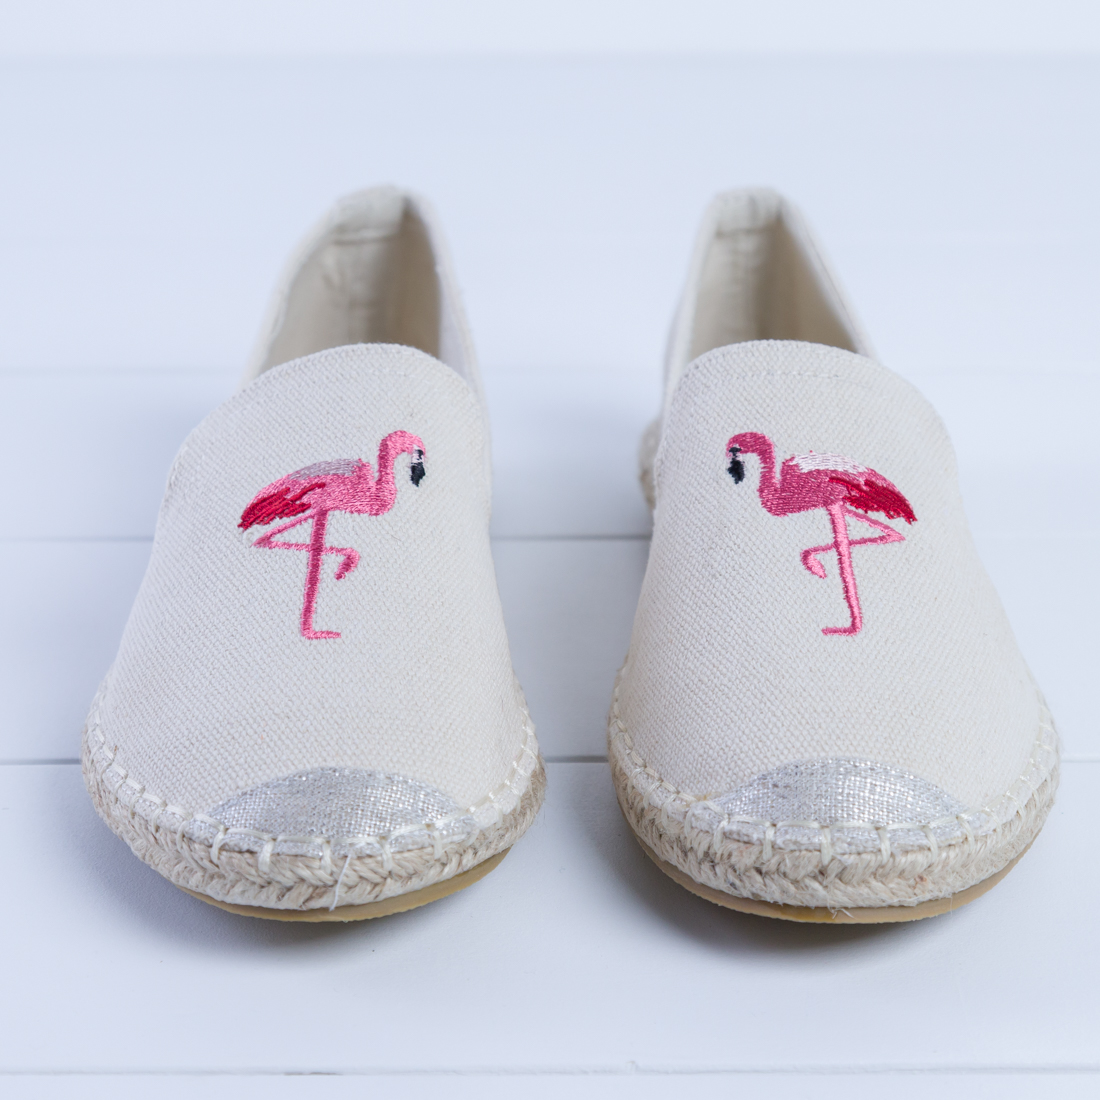 a103875a445a Women s Footwear - Cracker Barrel